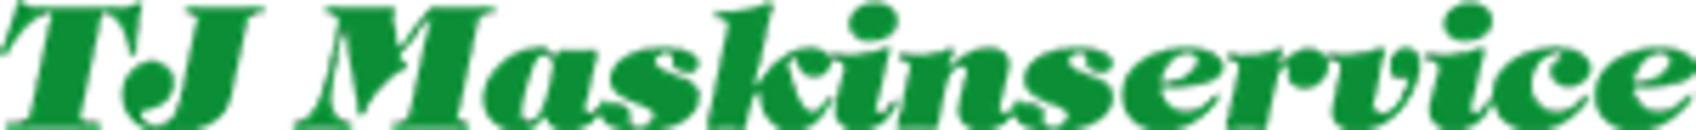 TJ Maskinservice logo